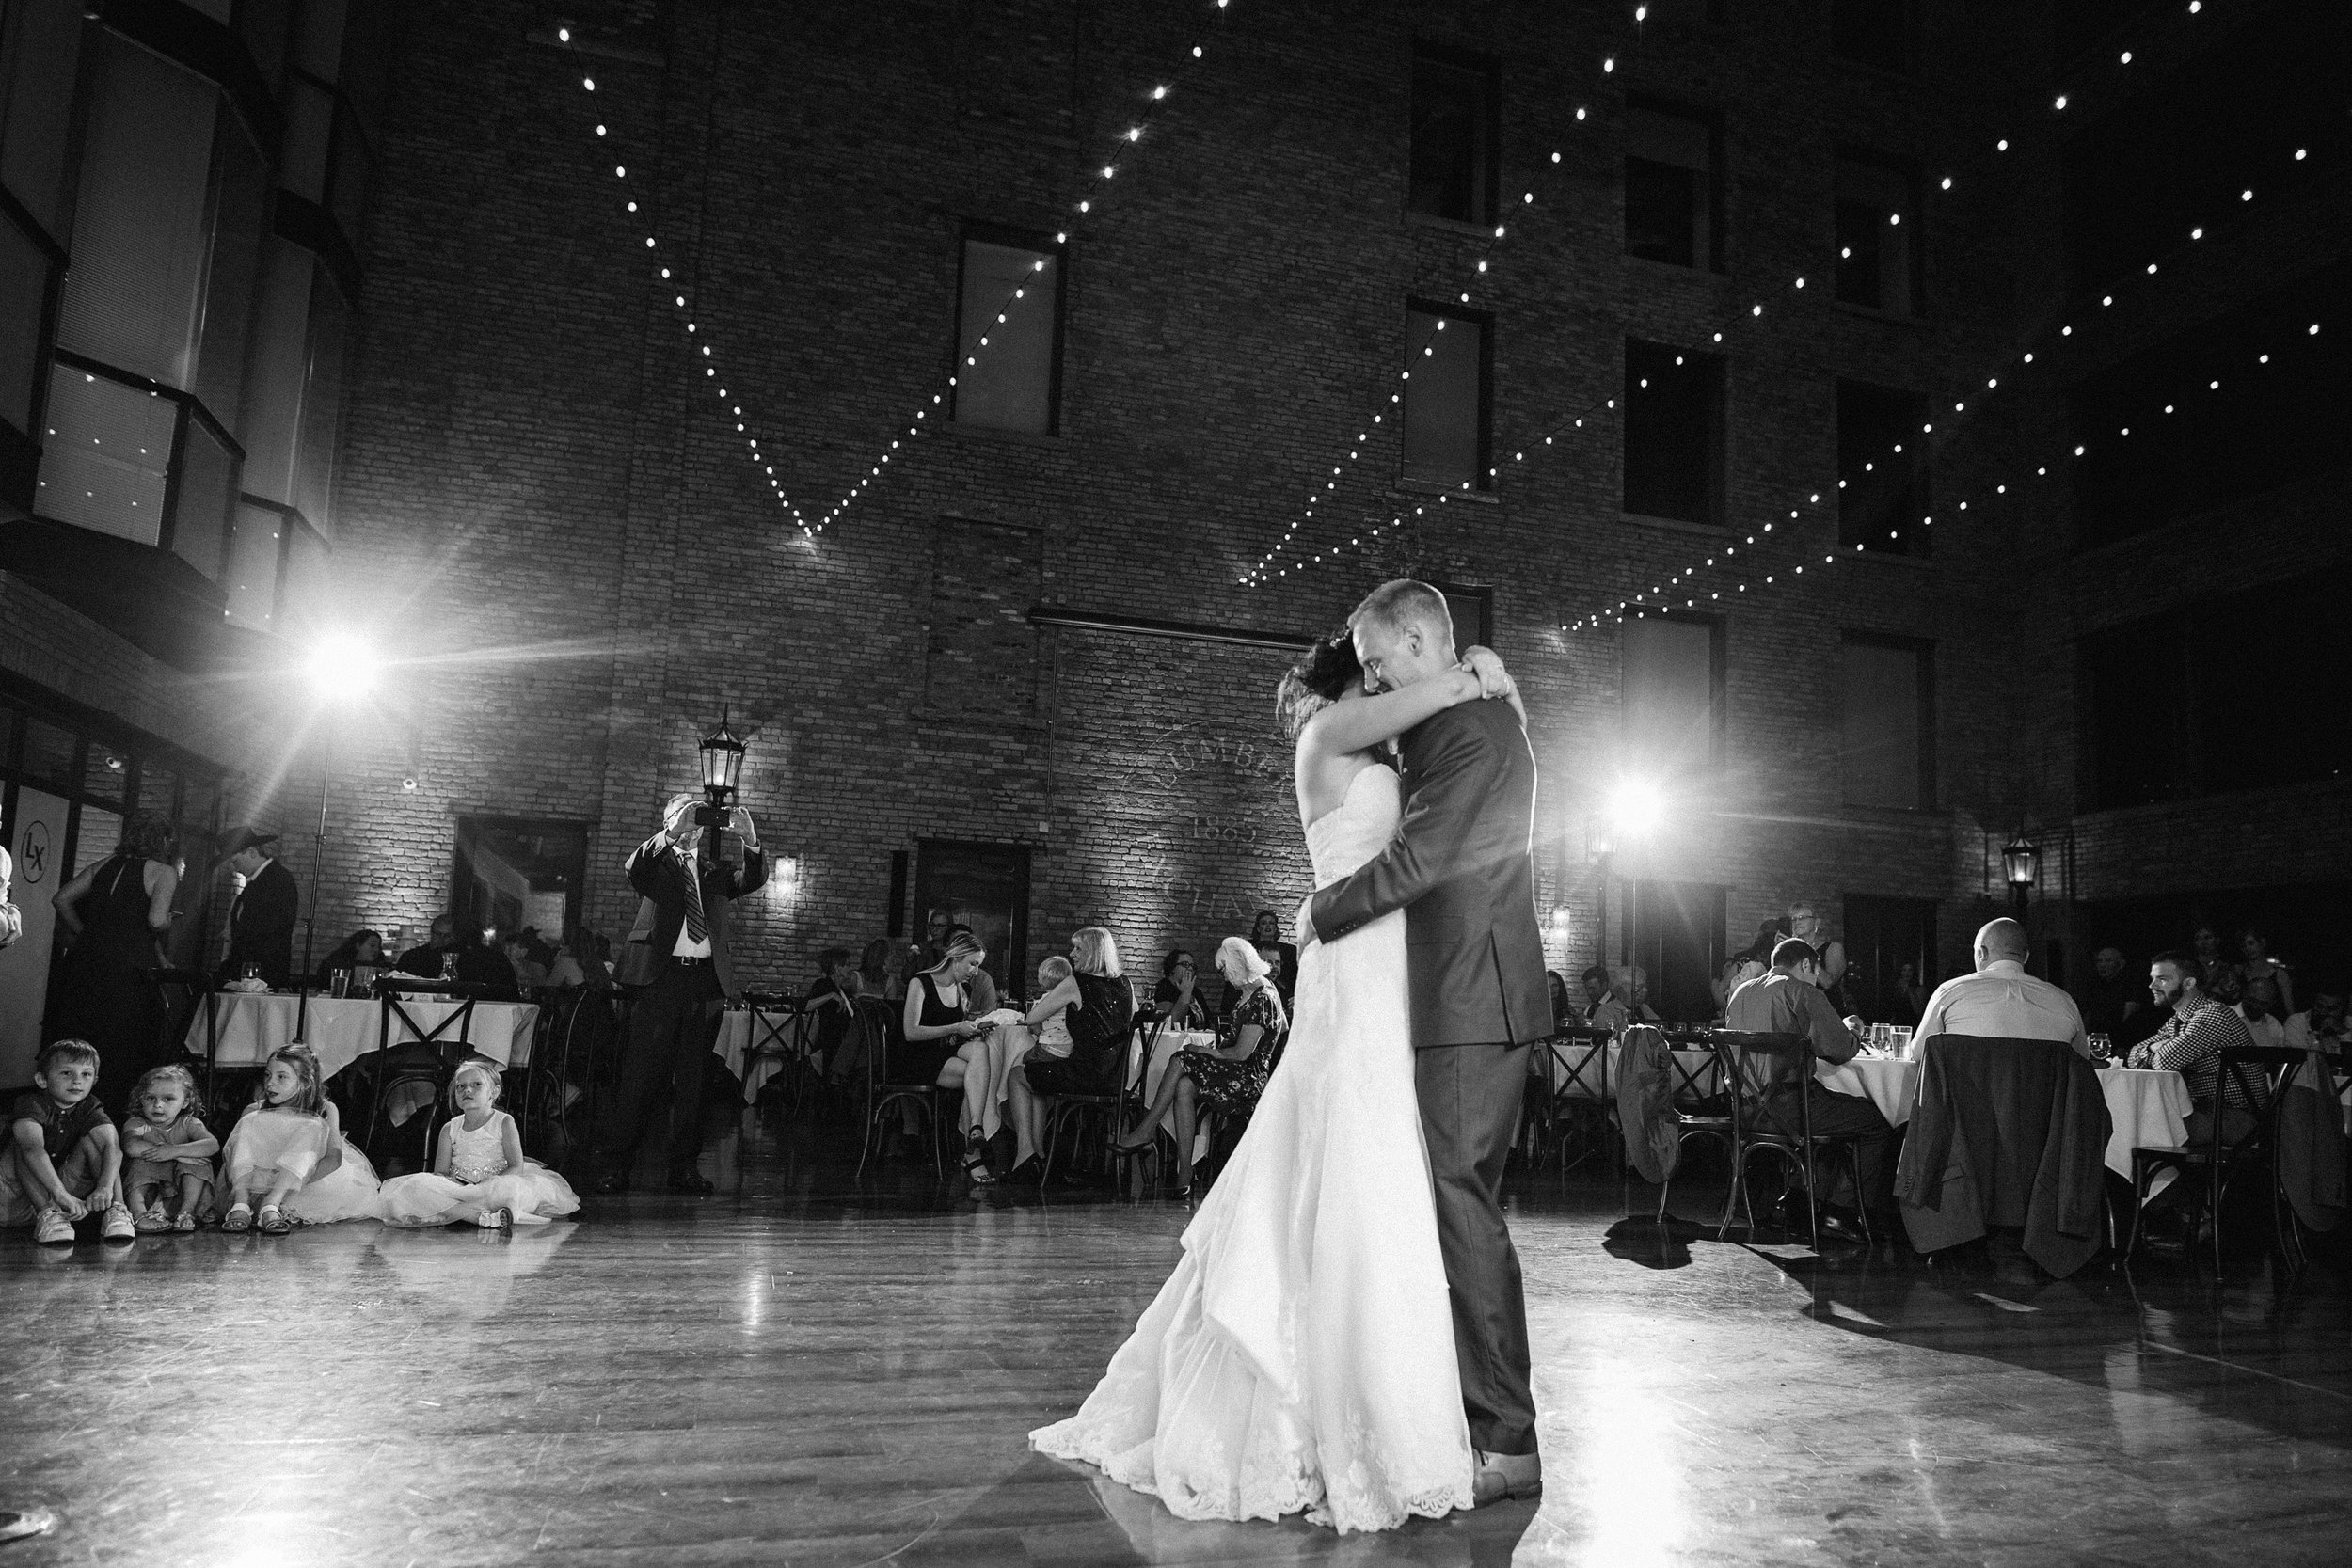 CourtneyIan_Wedding_Preview_0059.jpg